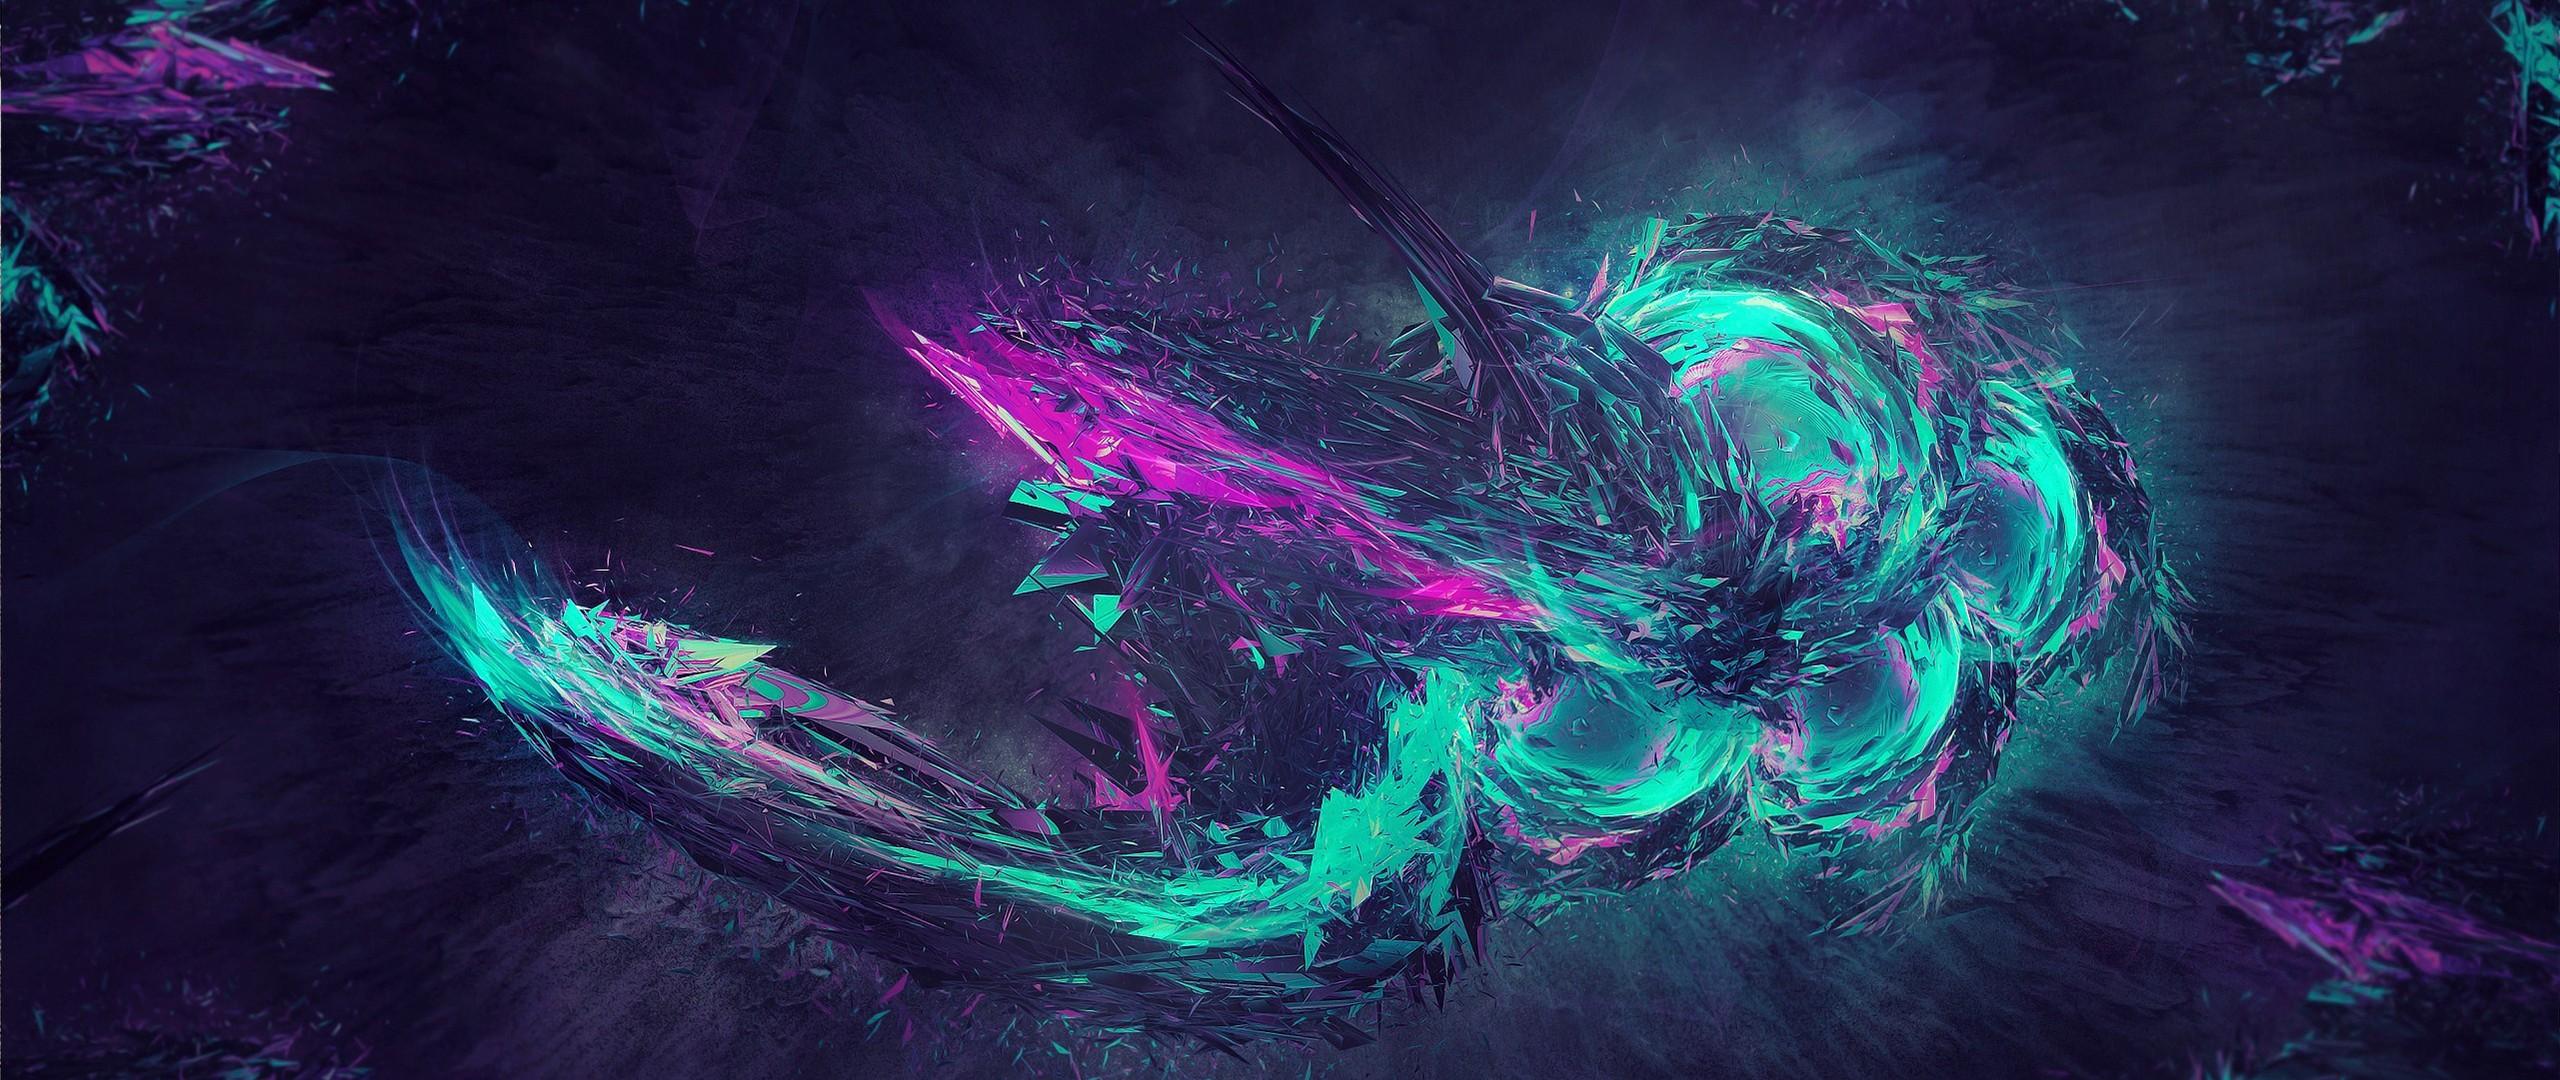 2560x1080 wallpaper